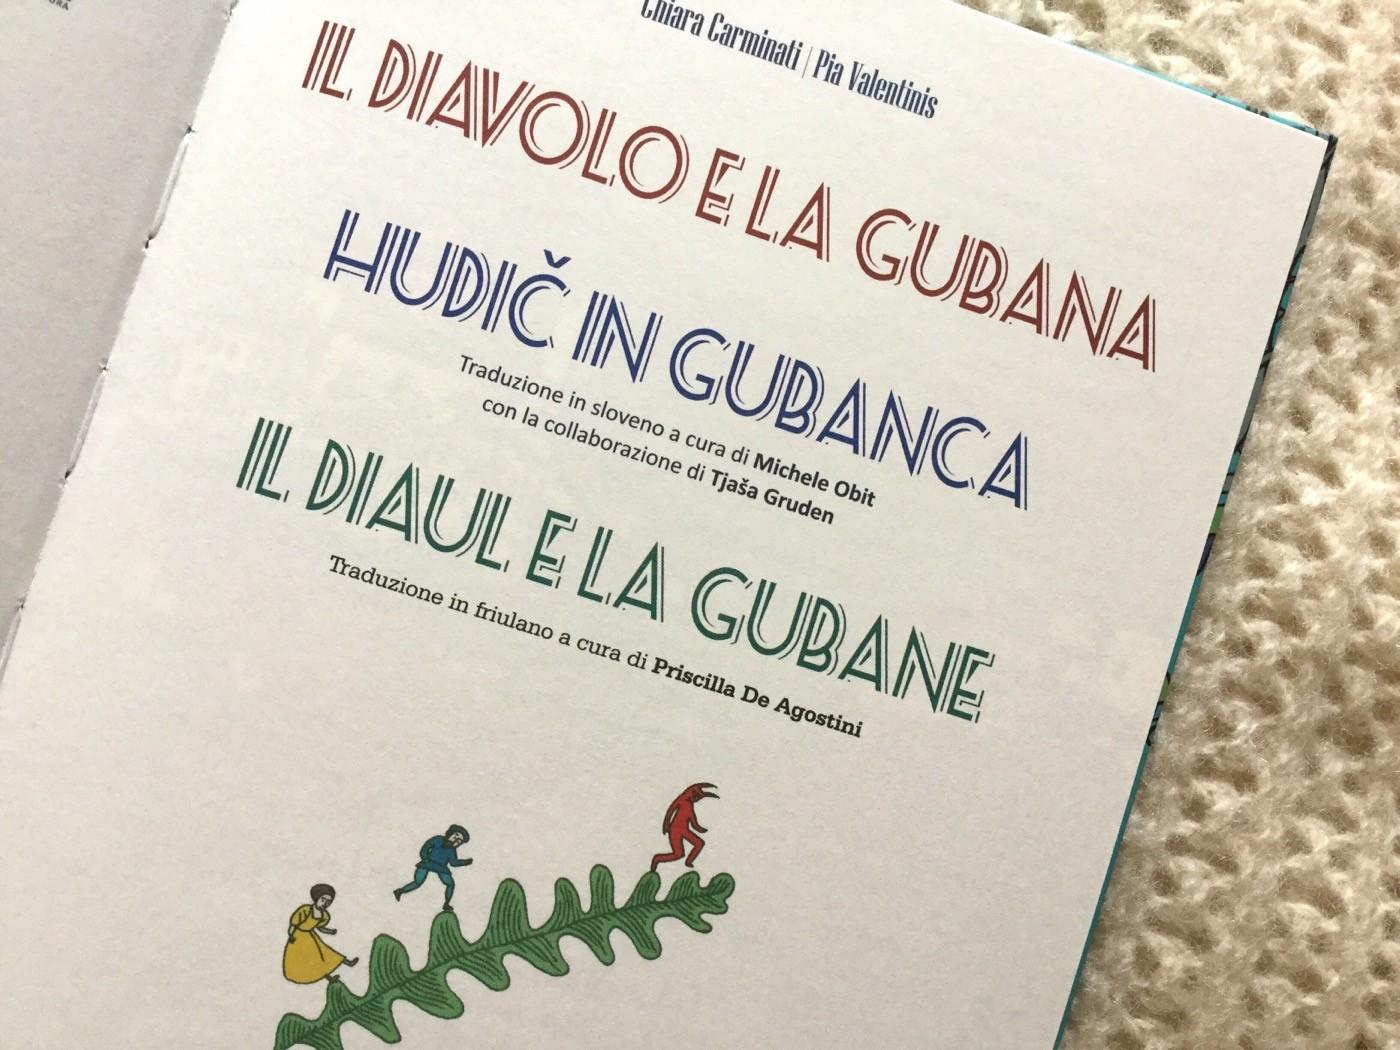 Il diavolo e la gubana | Chiara Carminati, Pia Valentinis | Sinnos - Galline Volanti